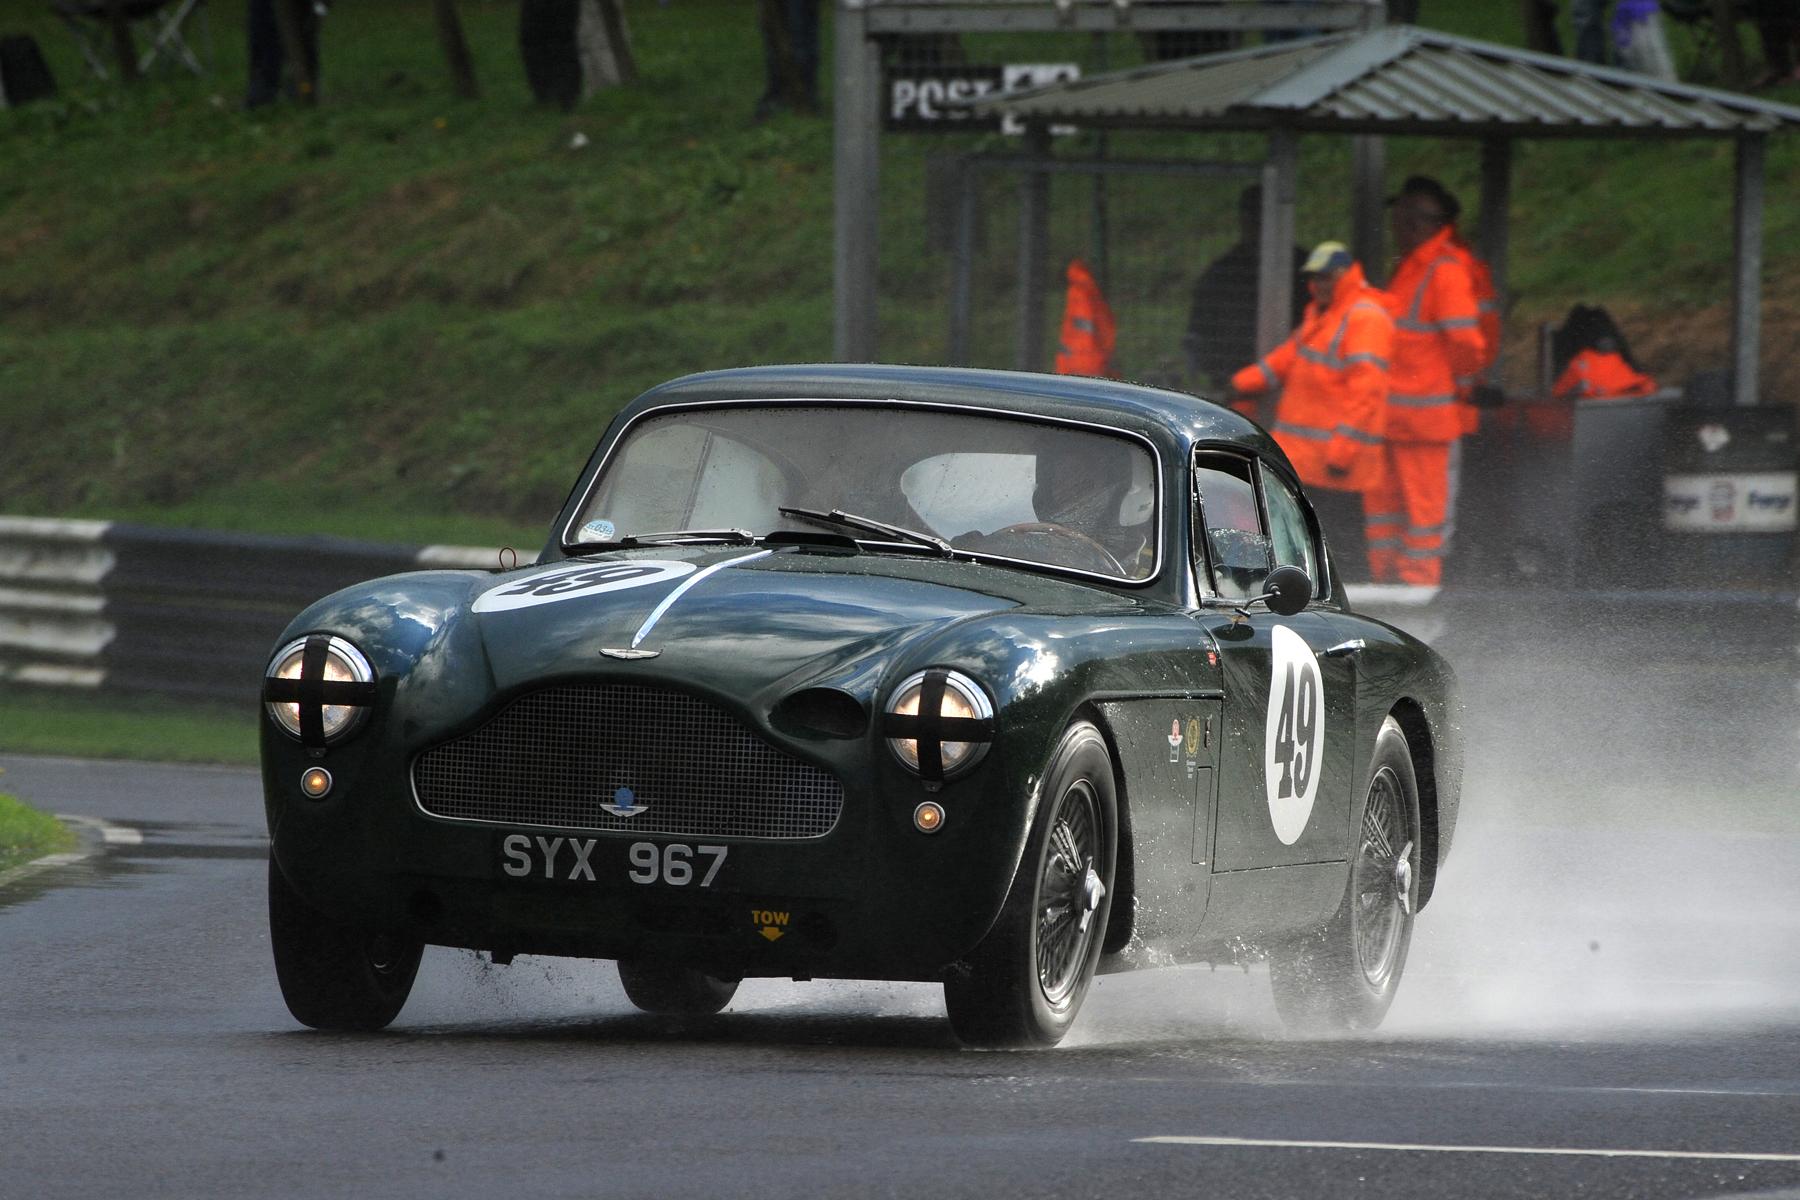 Remembering Jon. Chris Woodgate pilots Jon's old car to 4th overall. Photo - Jeff Bloxham